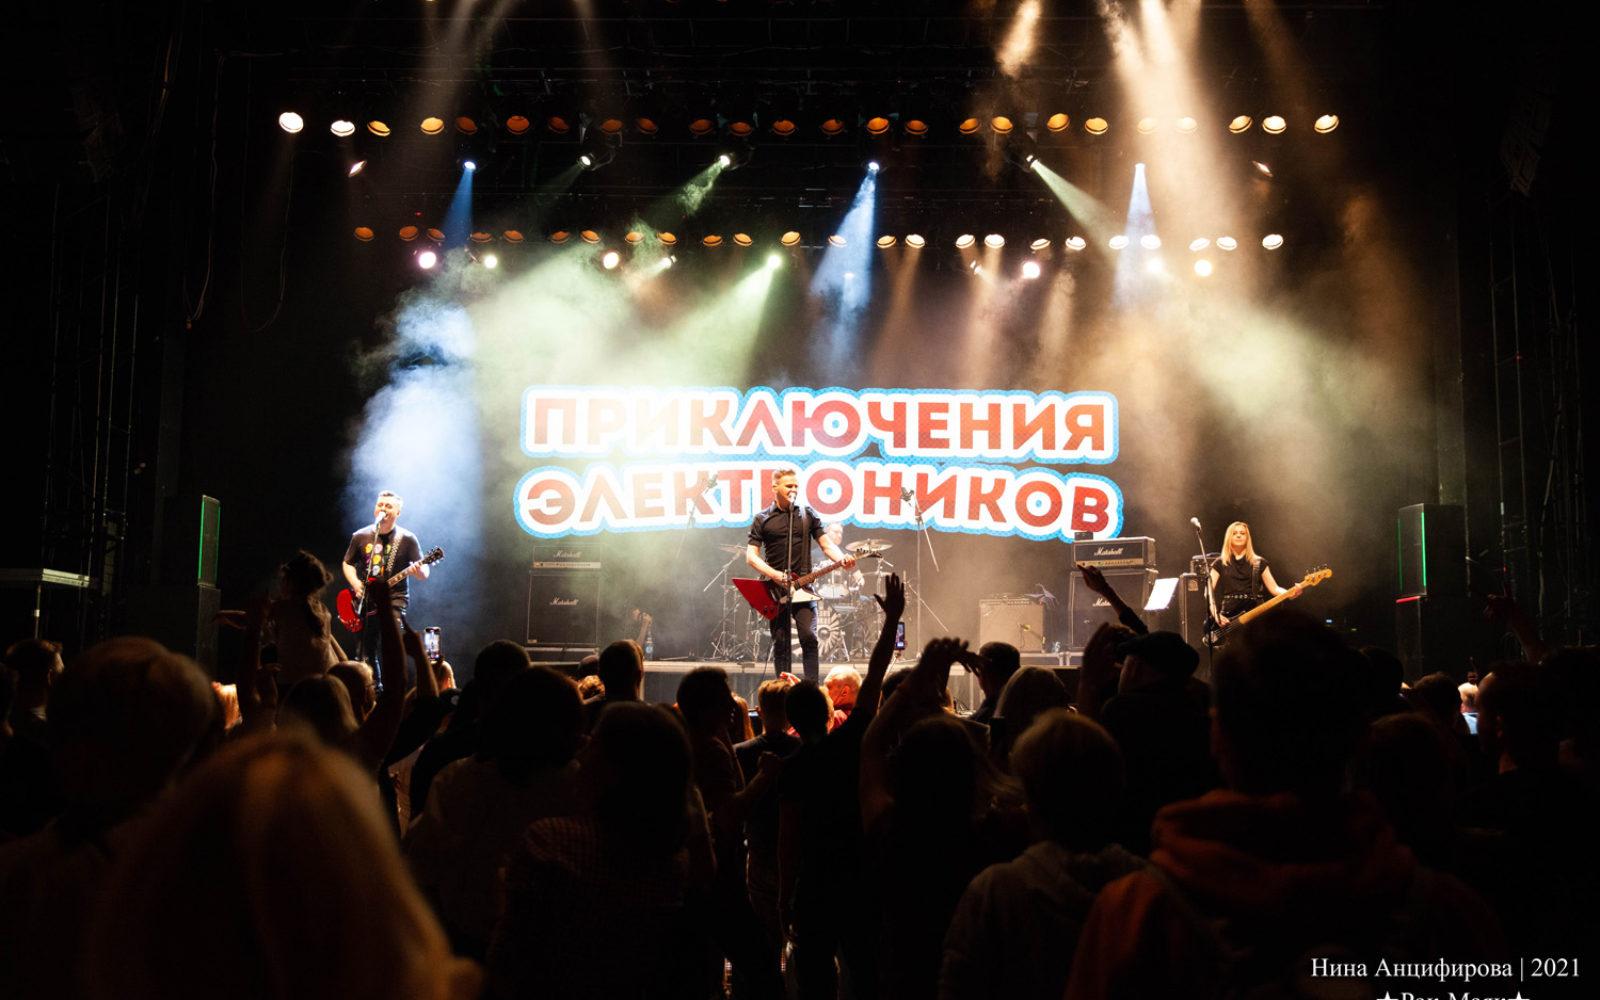 pr_electronikov (94 of 109)